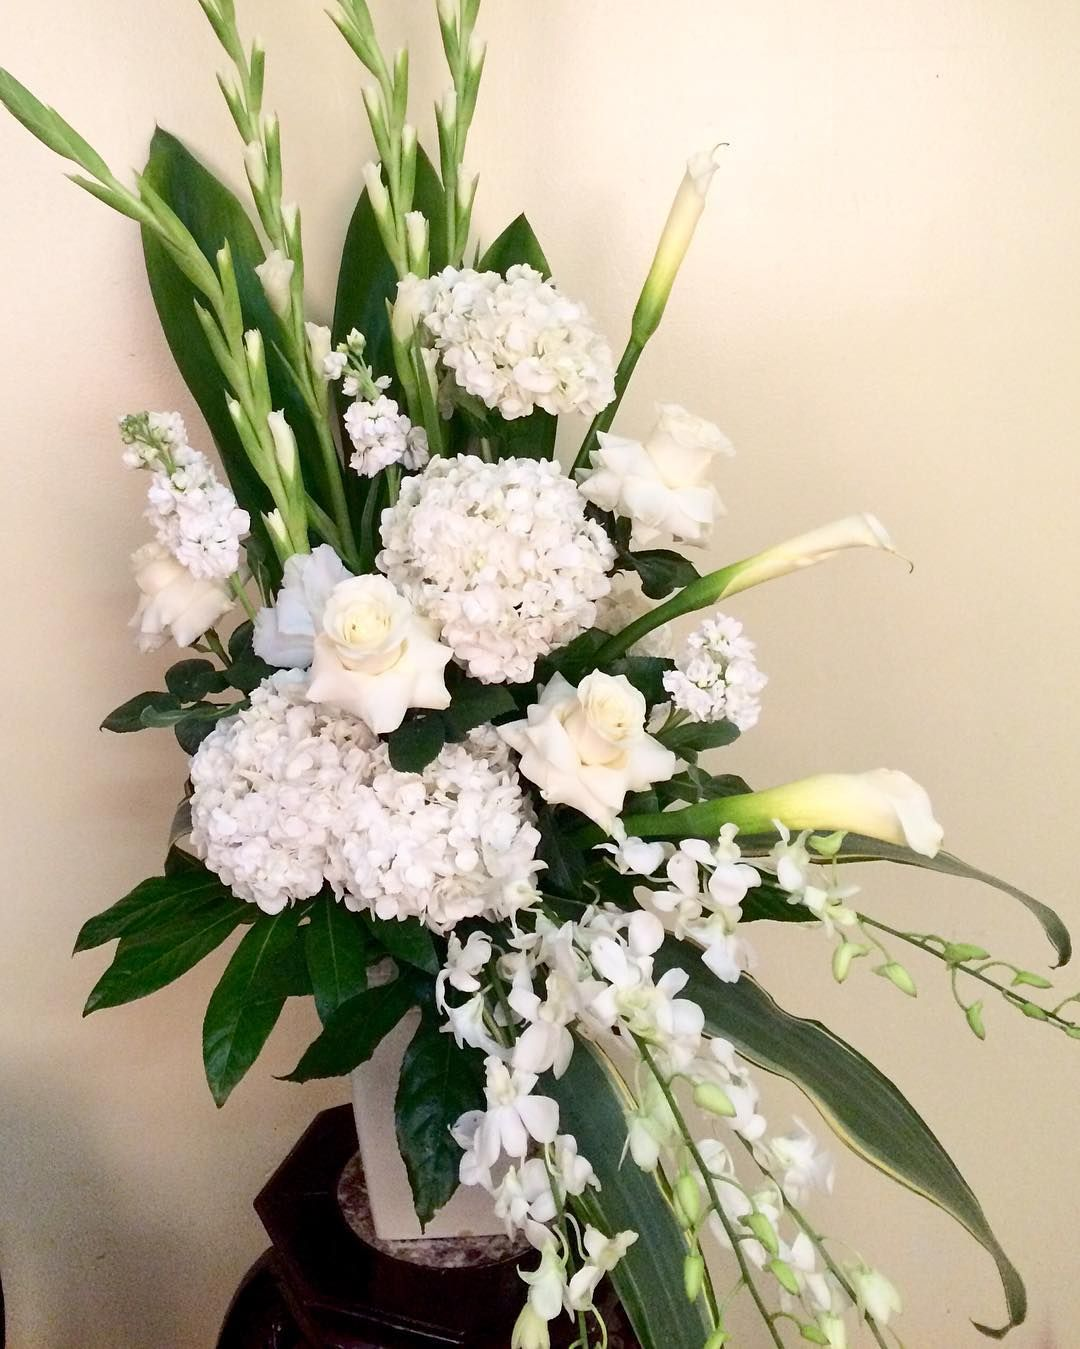 All White Perfection Orchids Roses And Hydrangea Bestfloristinhouston Bestflowersinhouston Houstonflorist Houstonflowers Flowersbynino Whiteflowers We